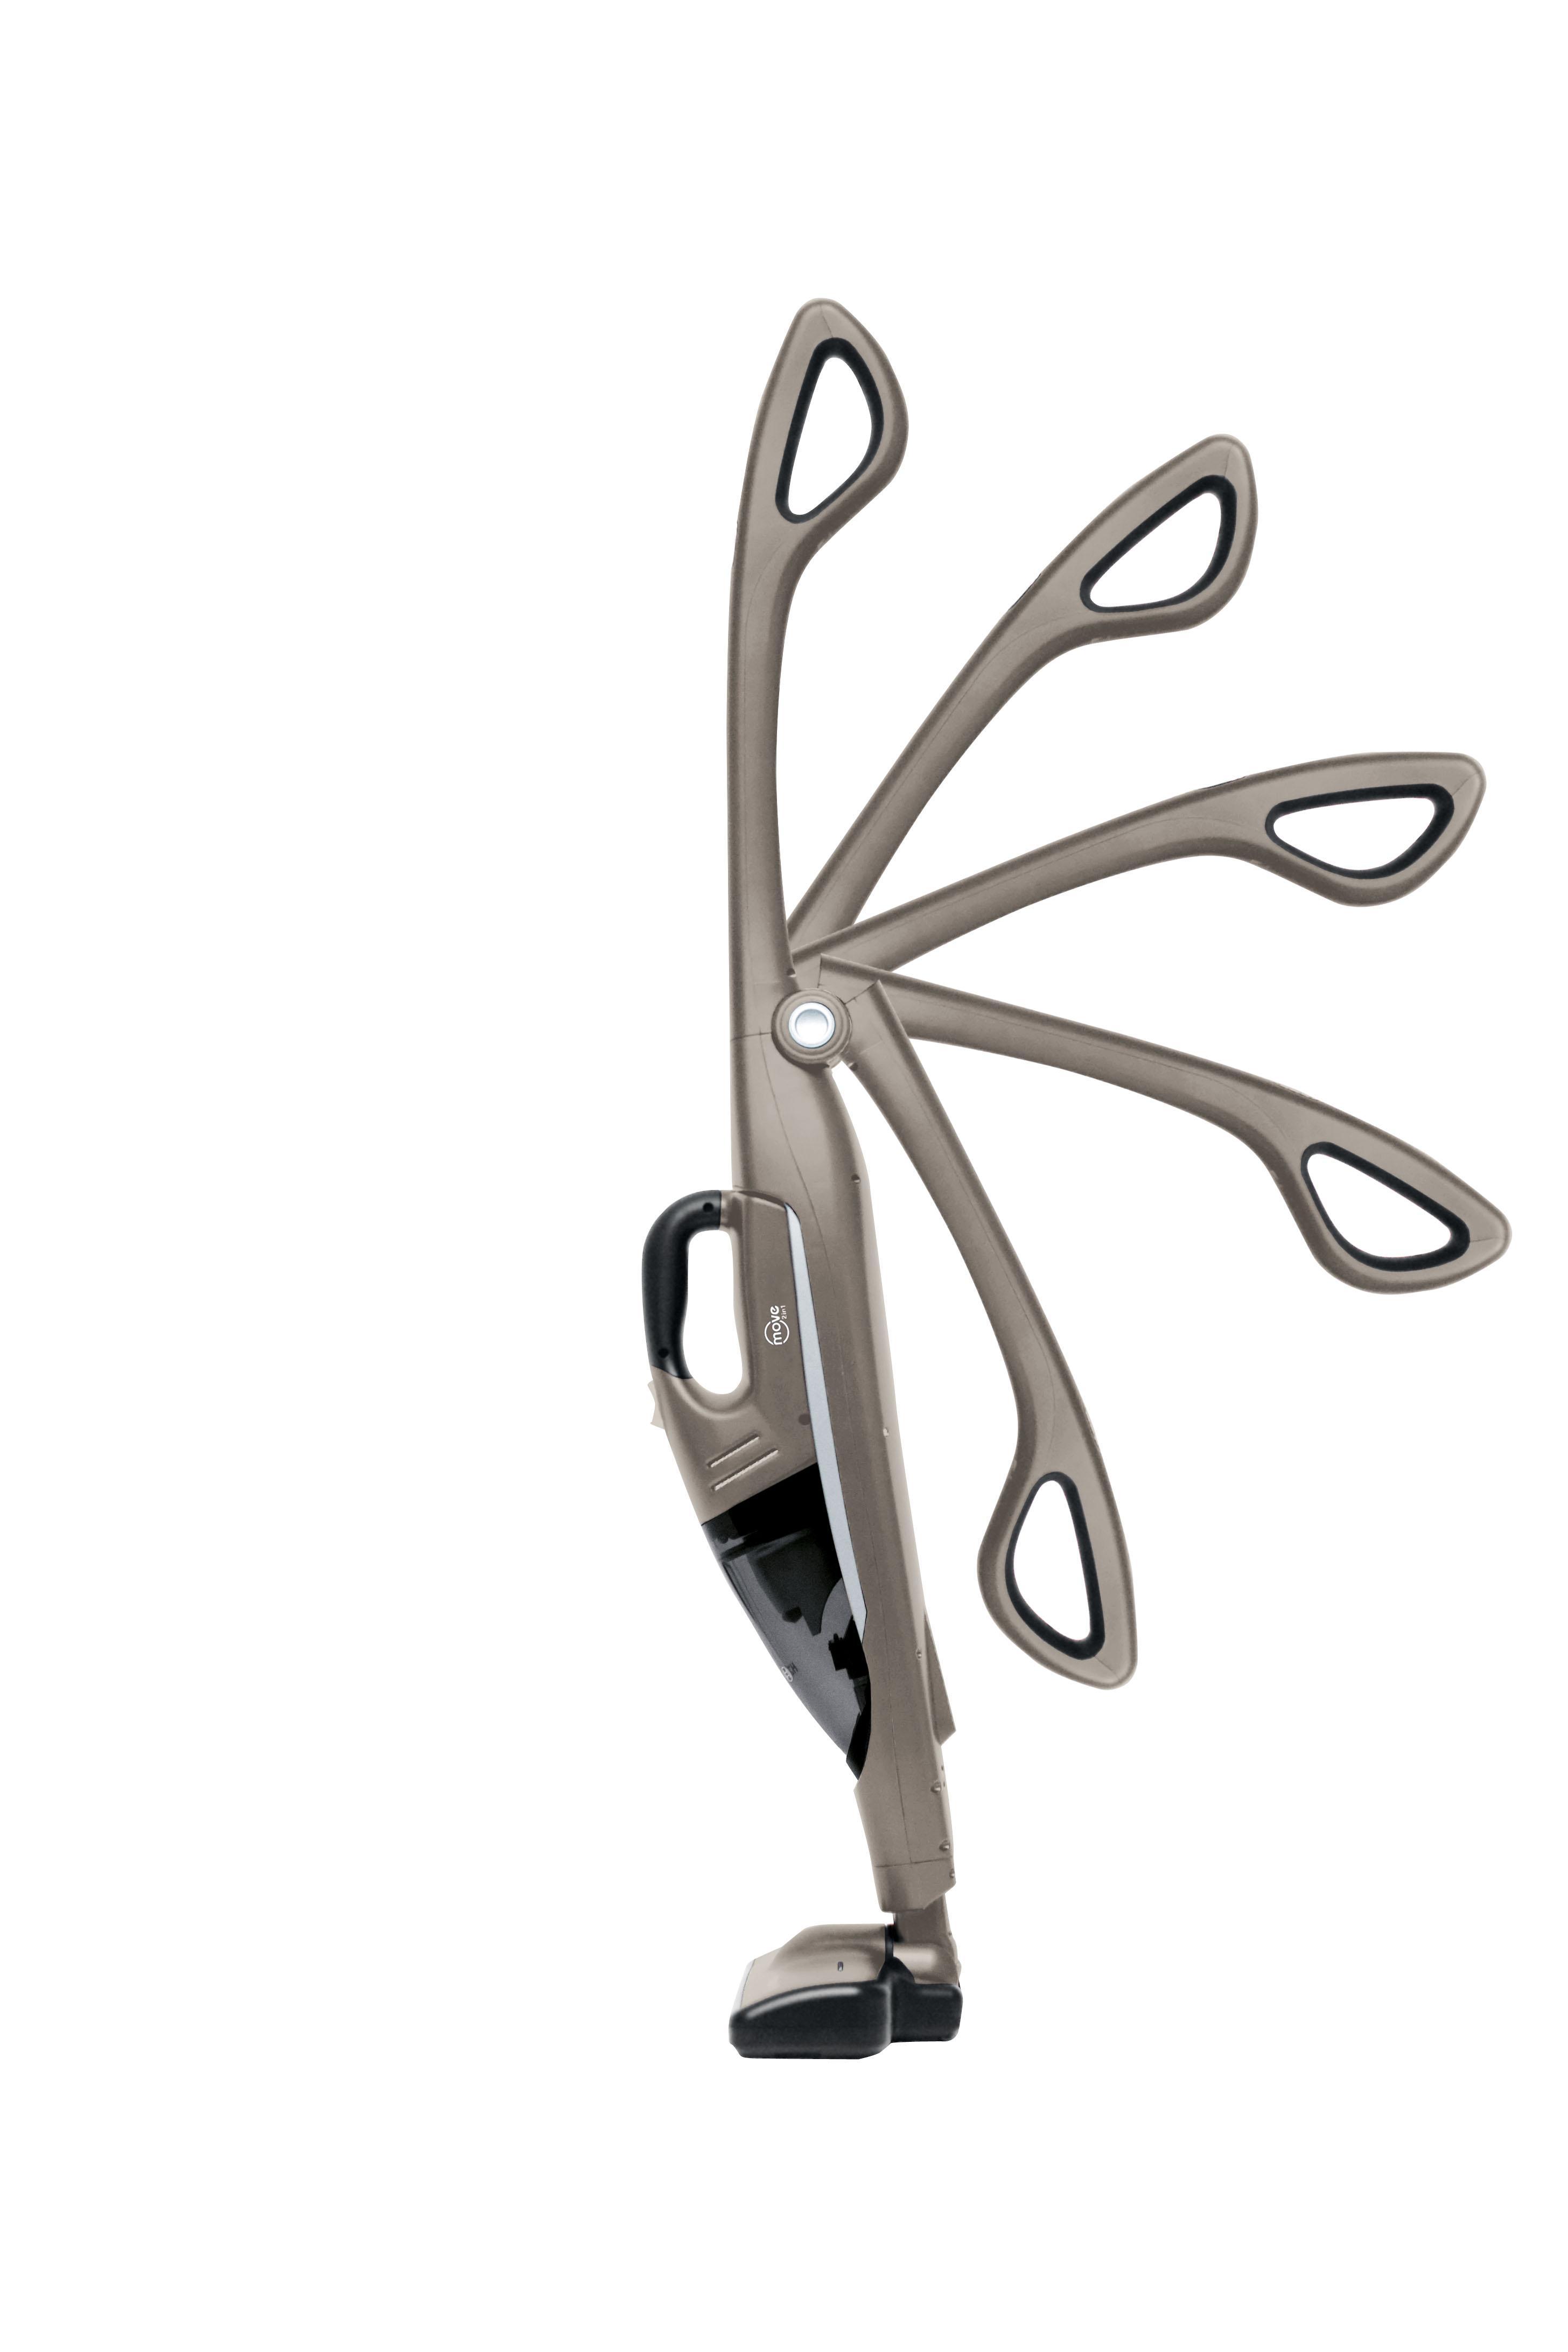 aspirateur balai bosch sans fil bbhmove4 electromenager. Black Bedroom Furniture Sets. Home Design Ideas